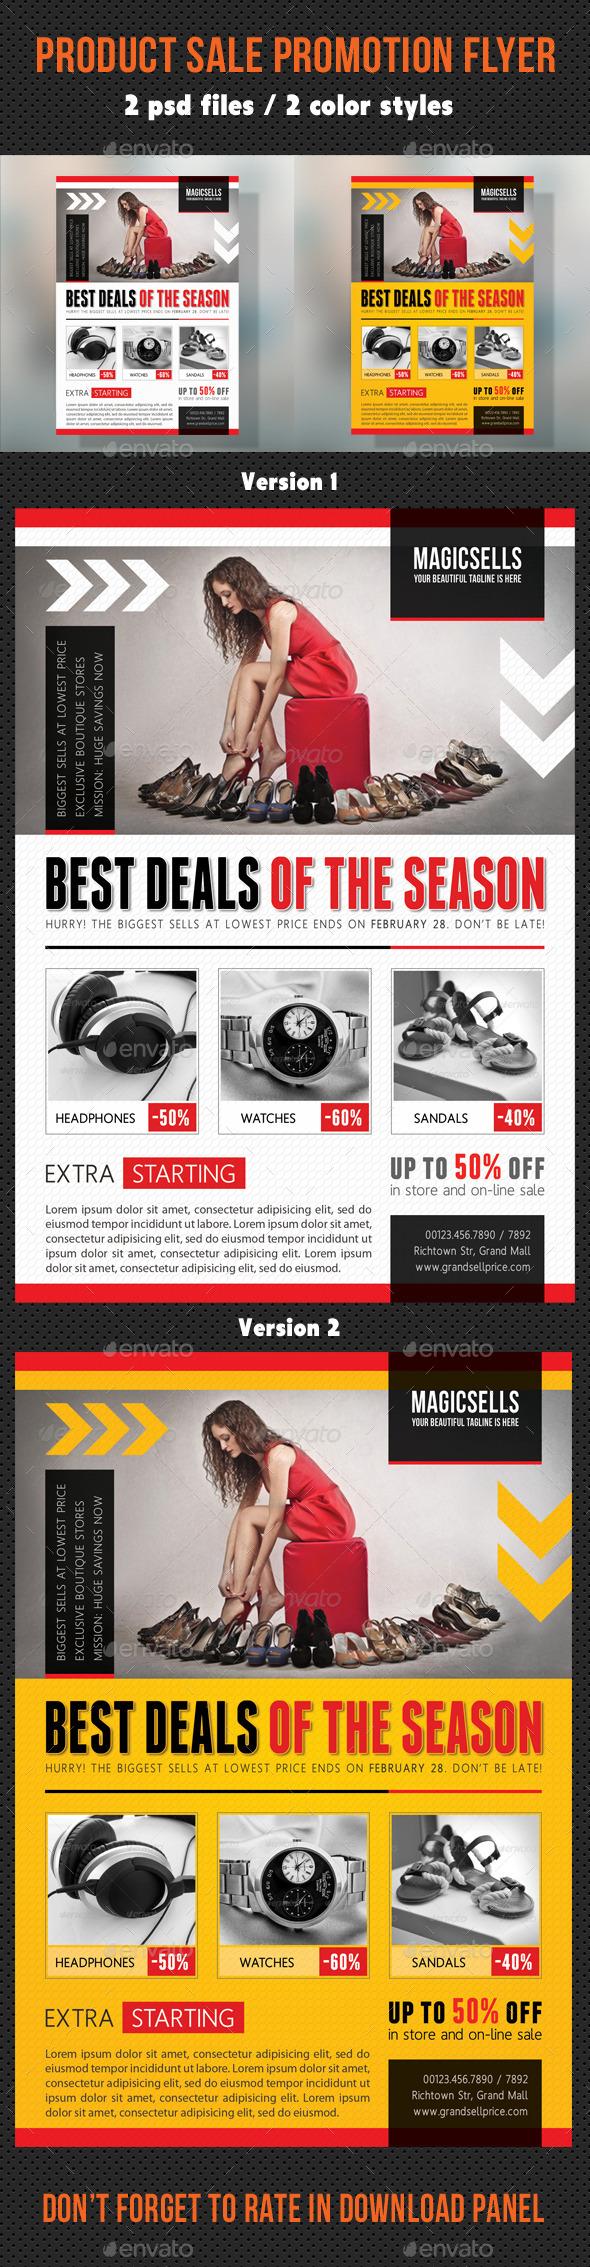 Product Sale Promotion Flyer V02 - Commerce Flyers